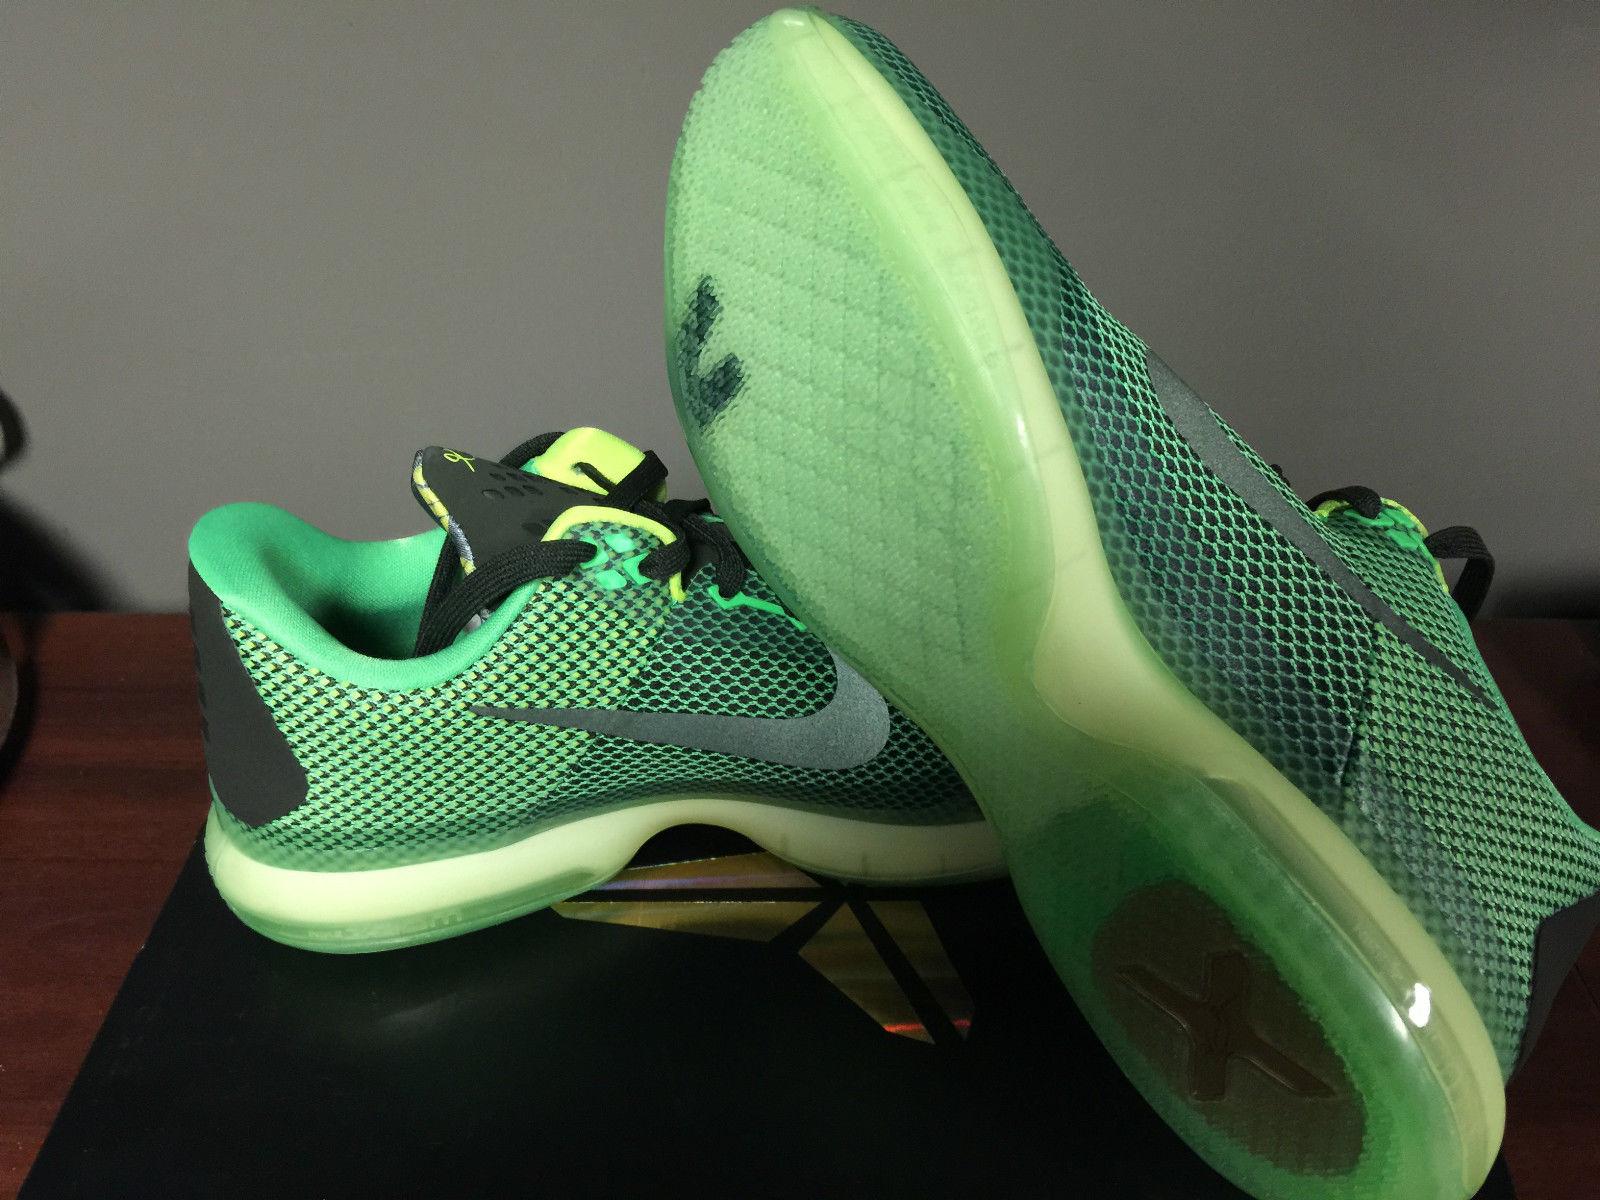 new product 72adb 64a4b ... Nike Kobe X  Vino  - Available ...